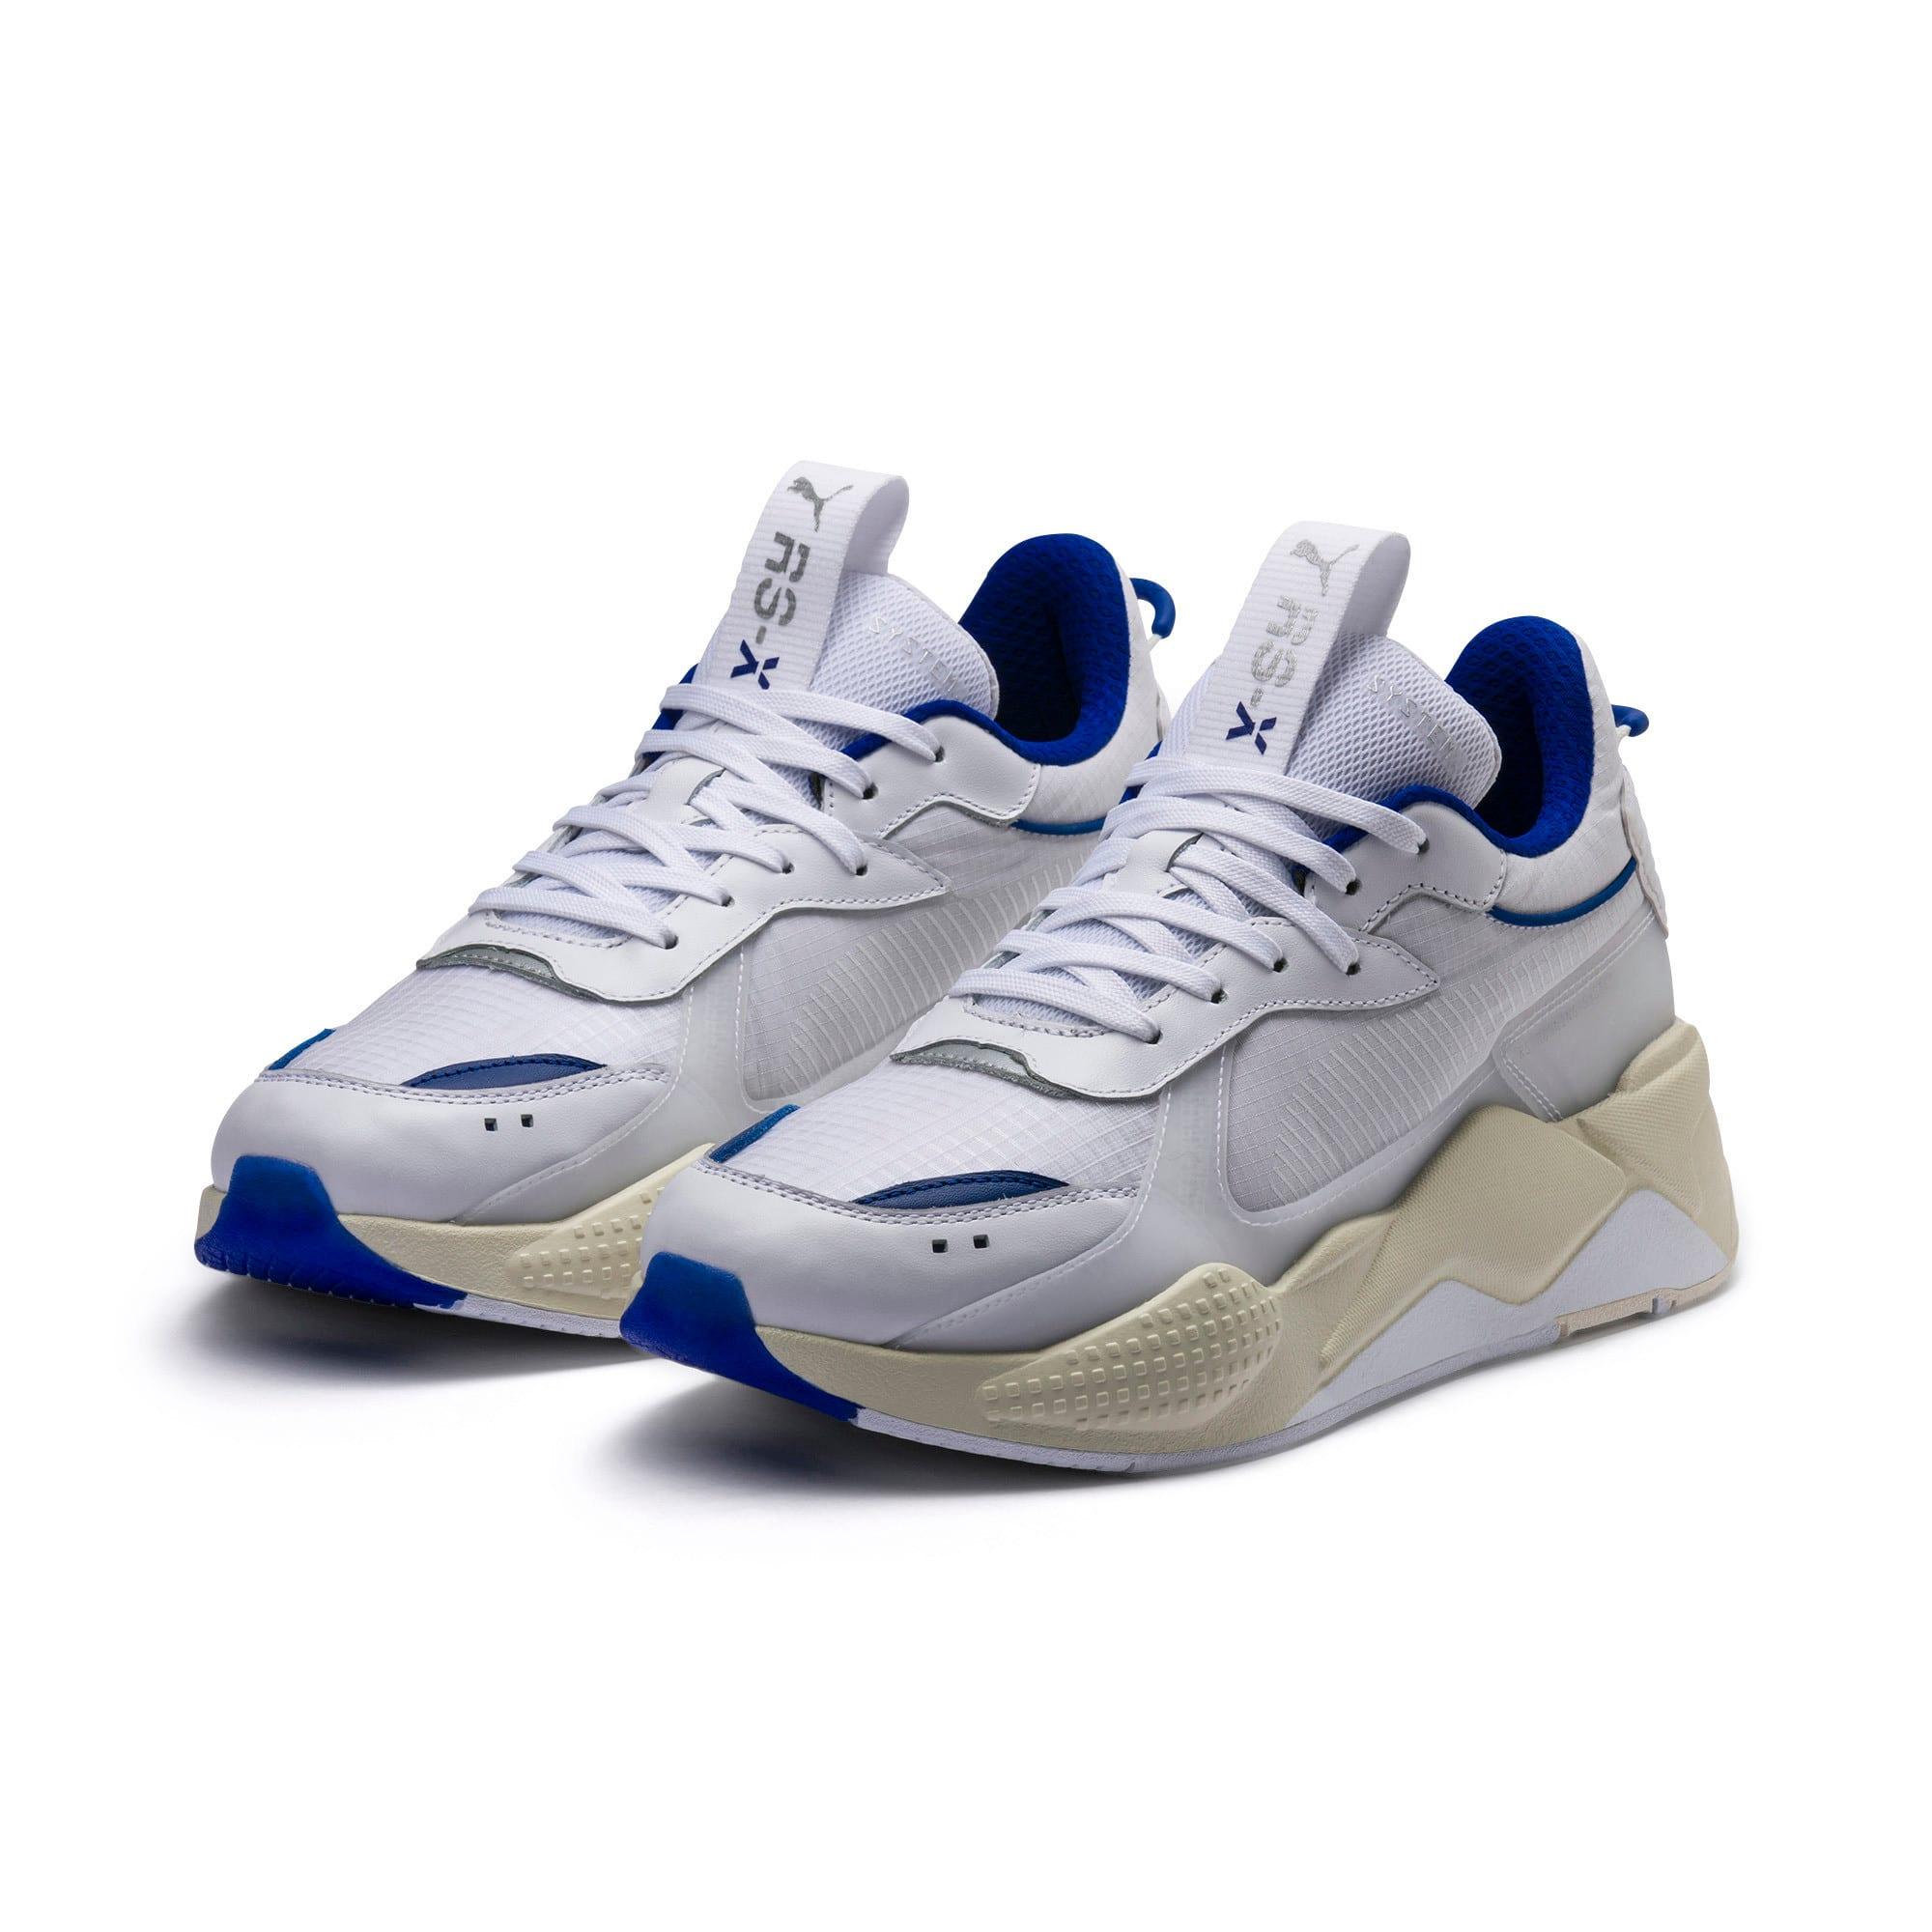 Thumbnail 3 of RS-X Tech Sneaker, Puma White-Whisper White, medium